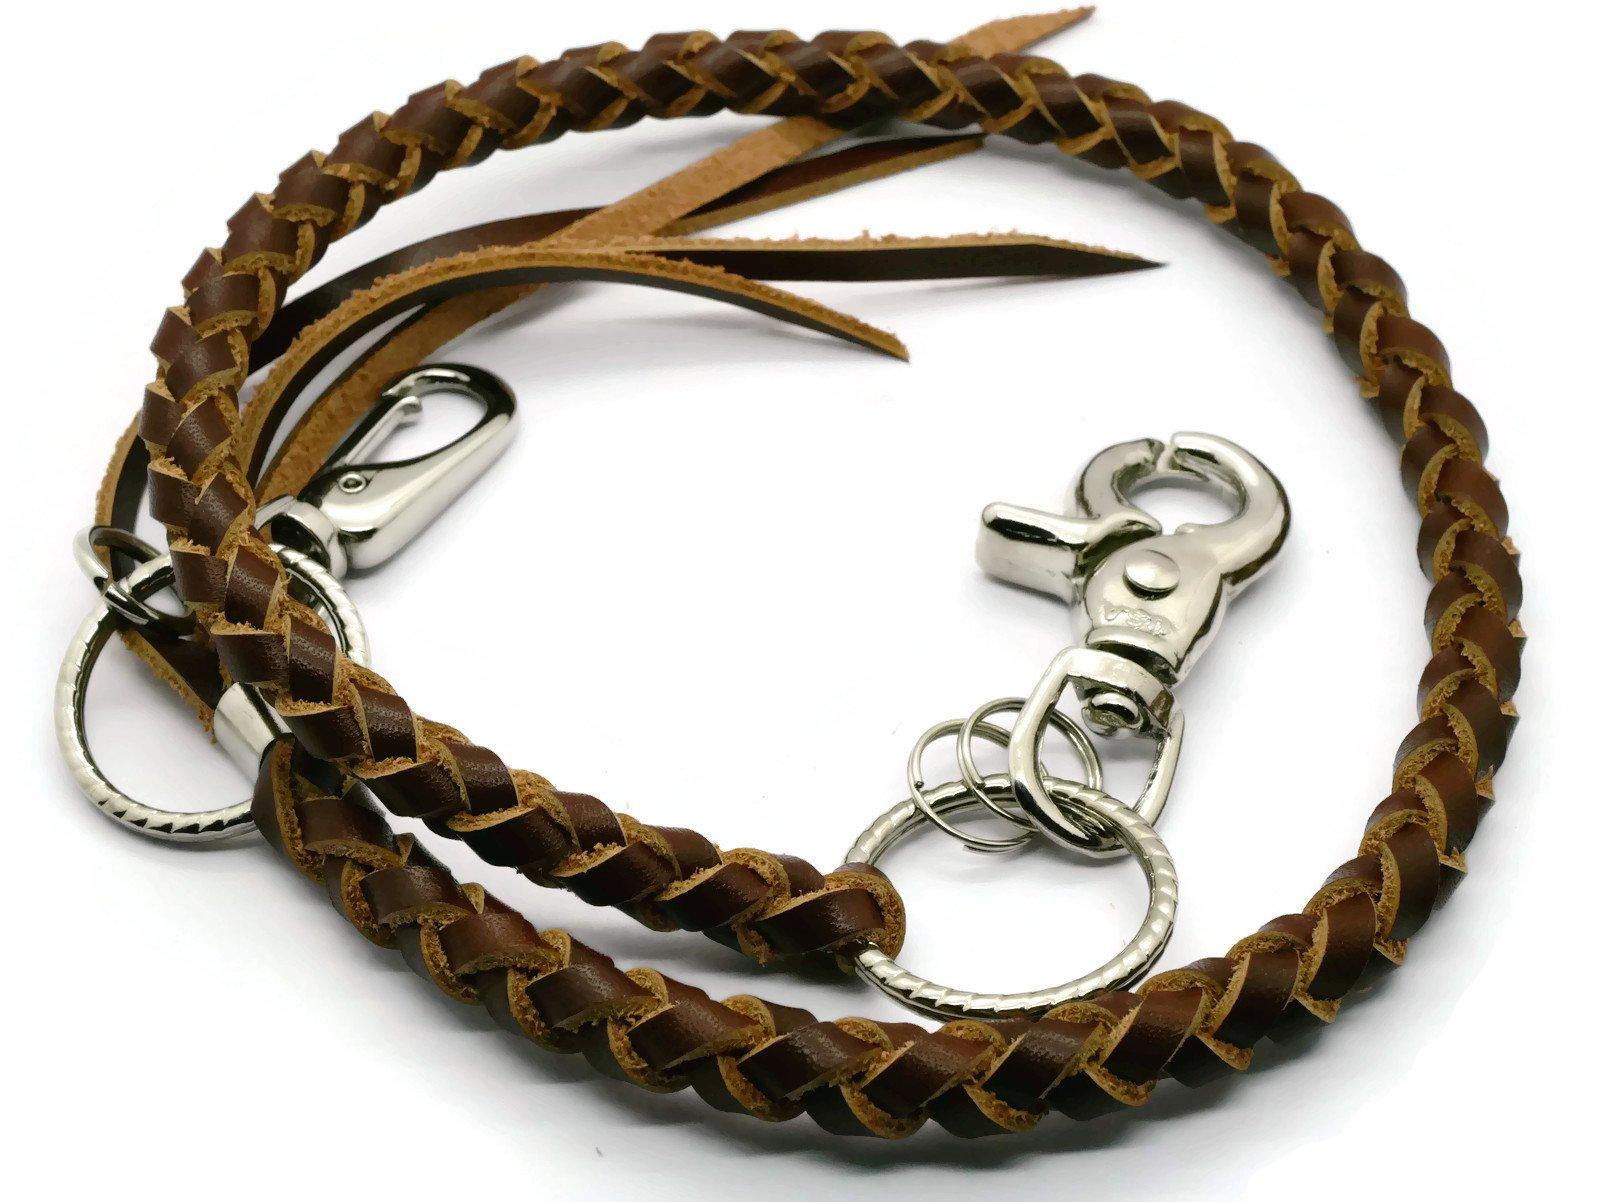 BrownBeans, Biker Style Mens Teens Braided Leather Lanyard Wallet Chain Fob Key Holder Wallet Strap (BBKC7003) (B02)